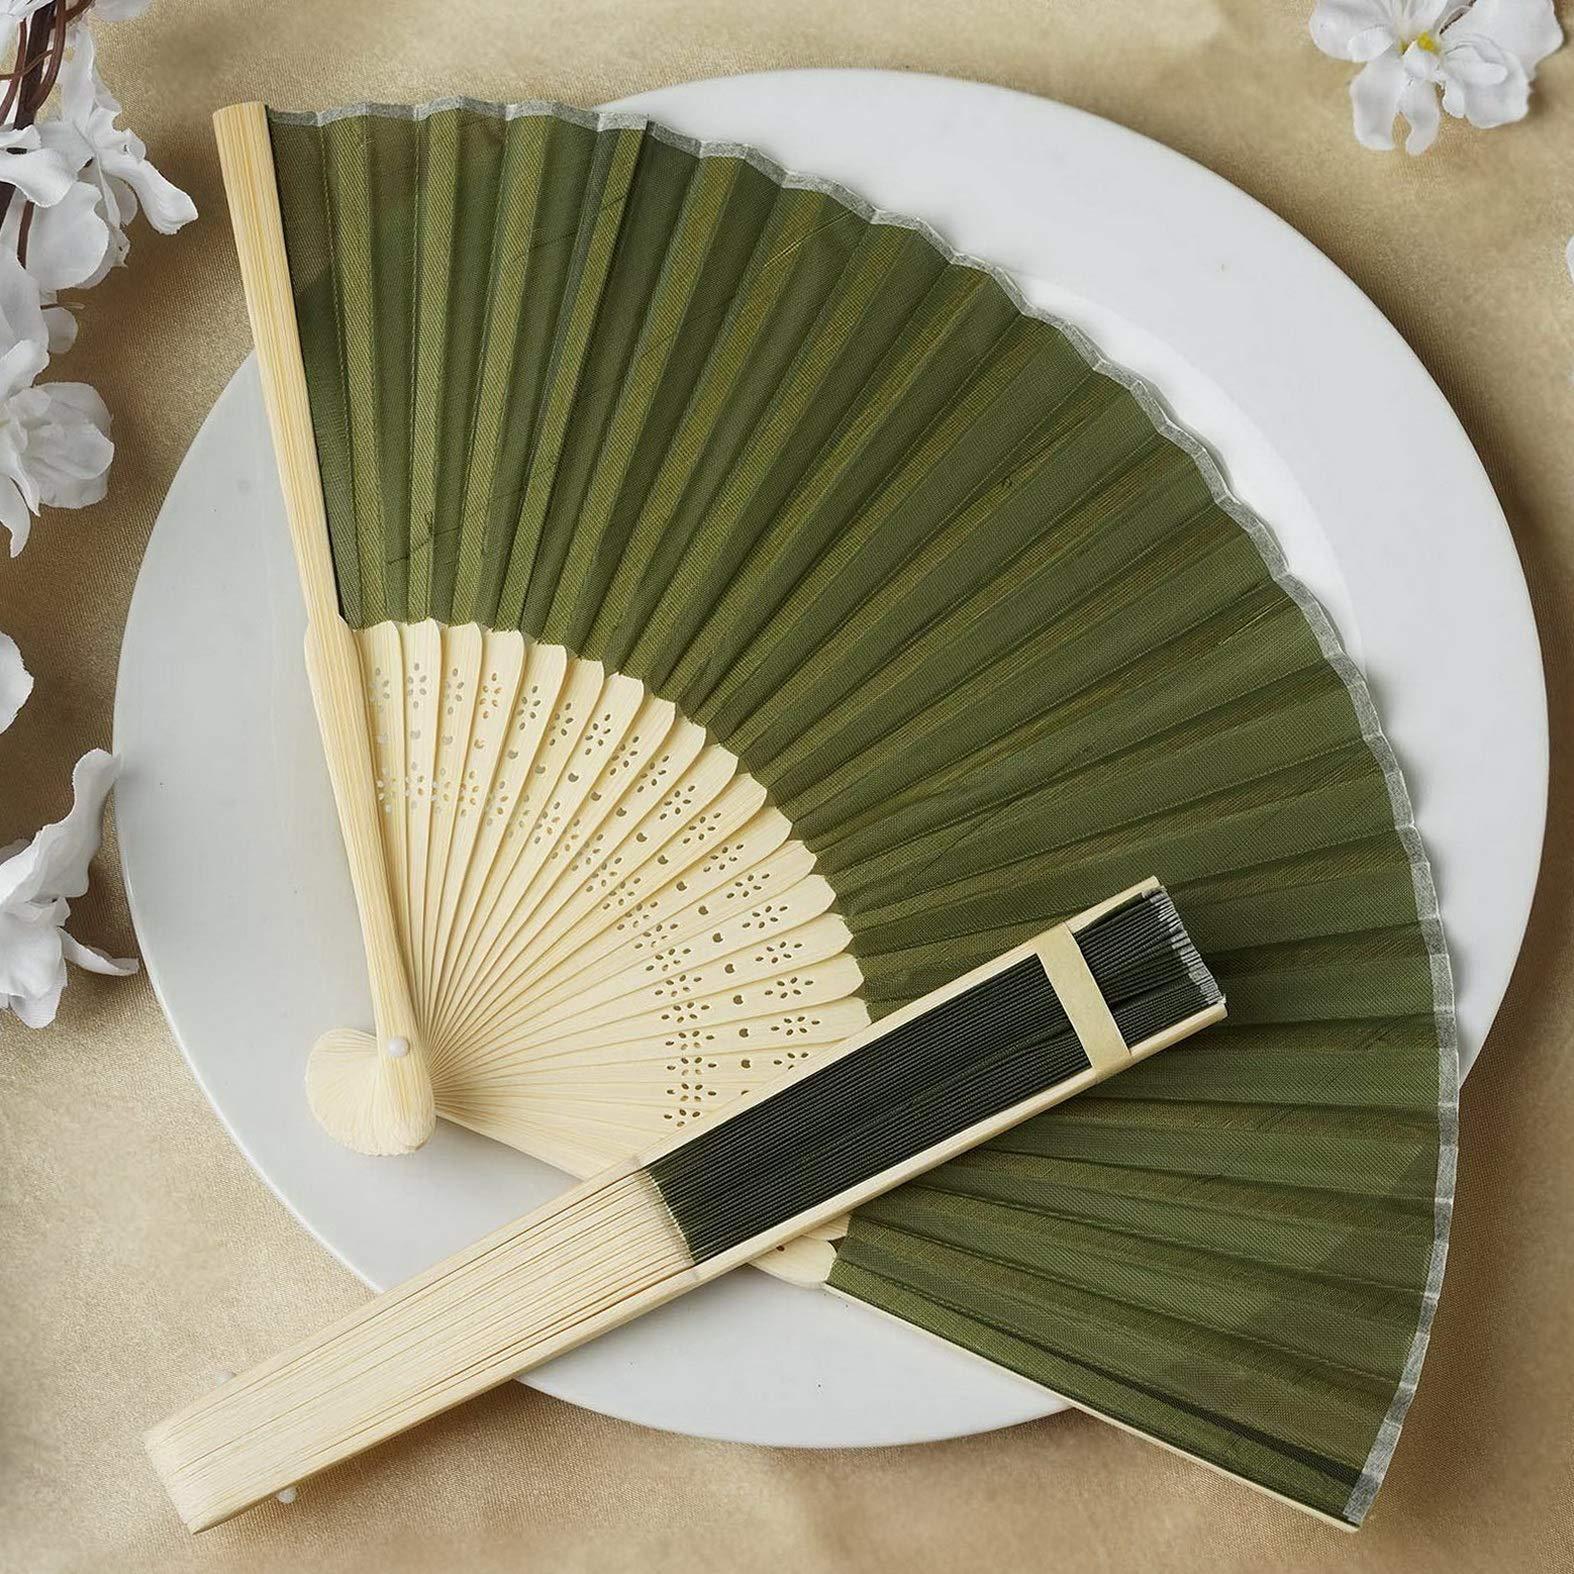 Mikash 50 pcs Silk Fabric Folding Hand Fans Wedding Party Favors Wholesale Decorations   Model WDDNGDCRTN - 17682  